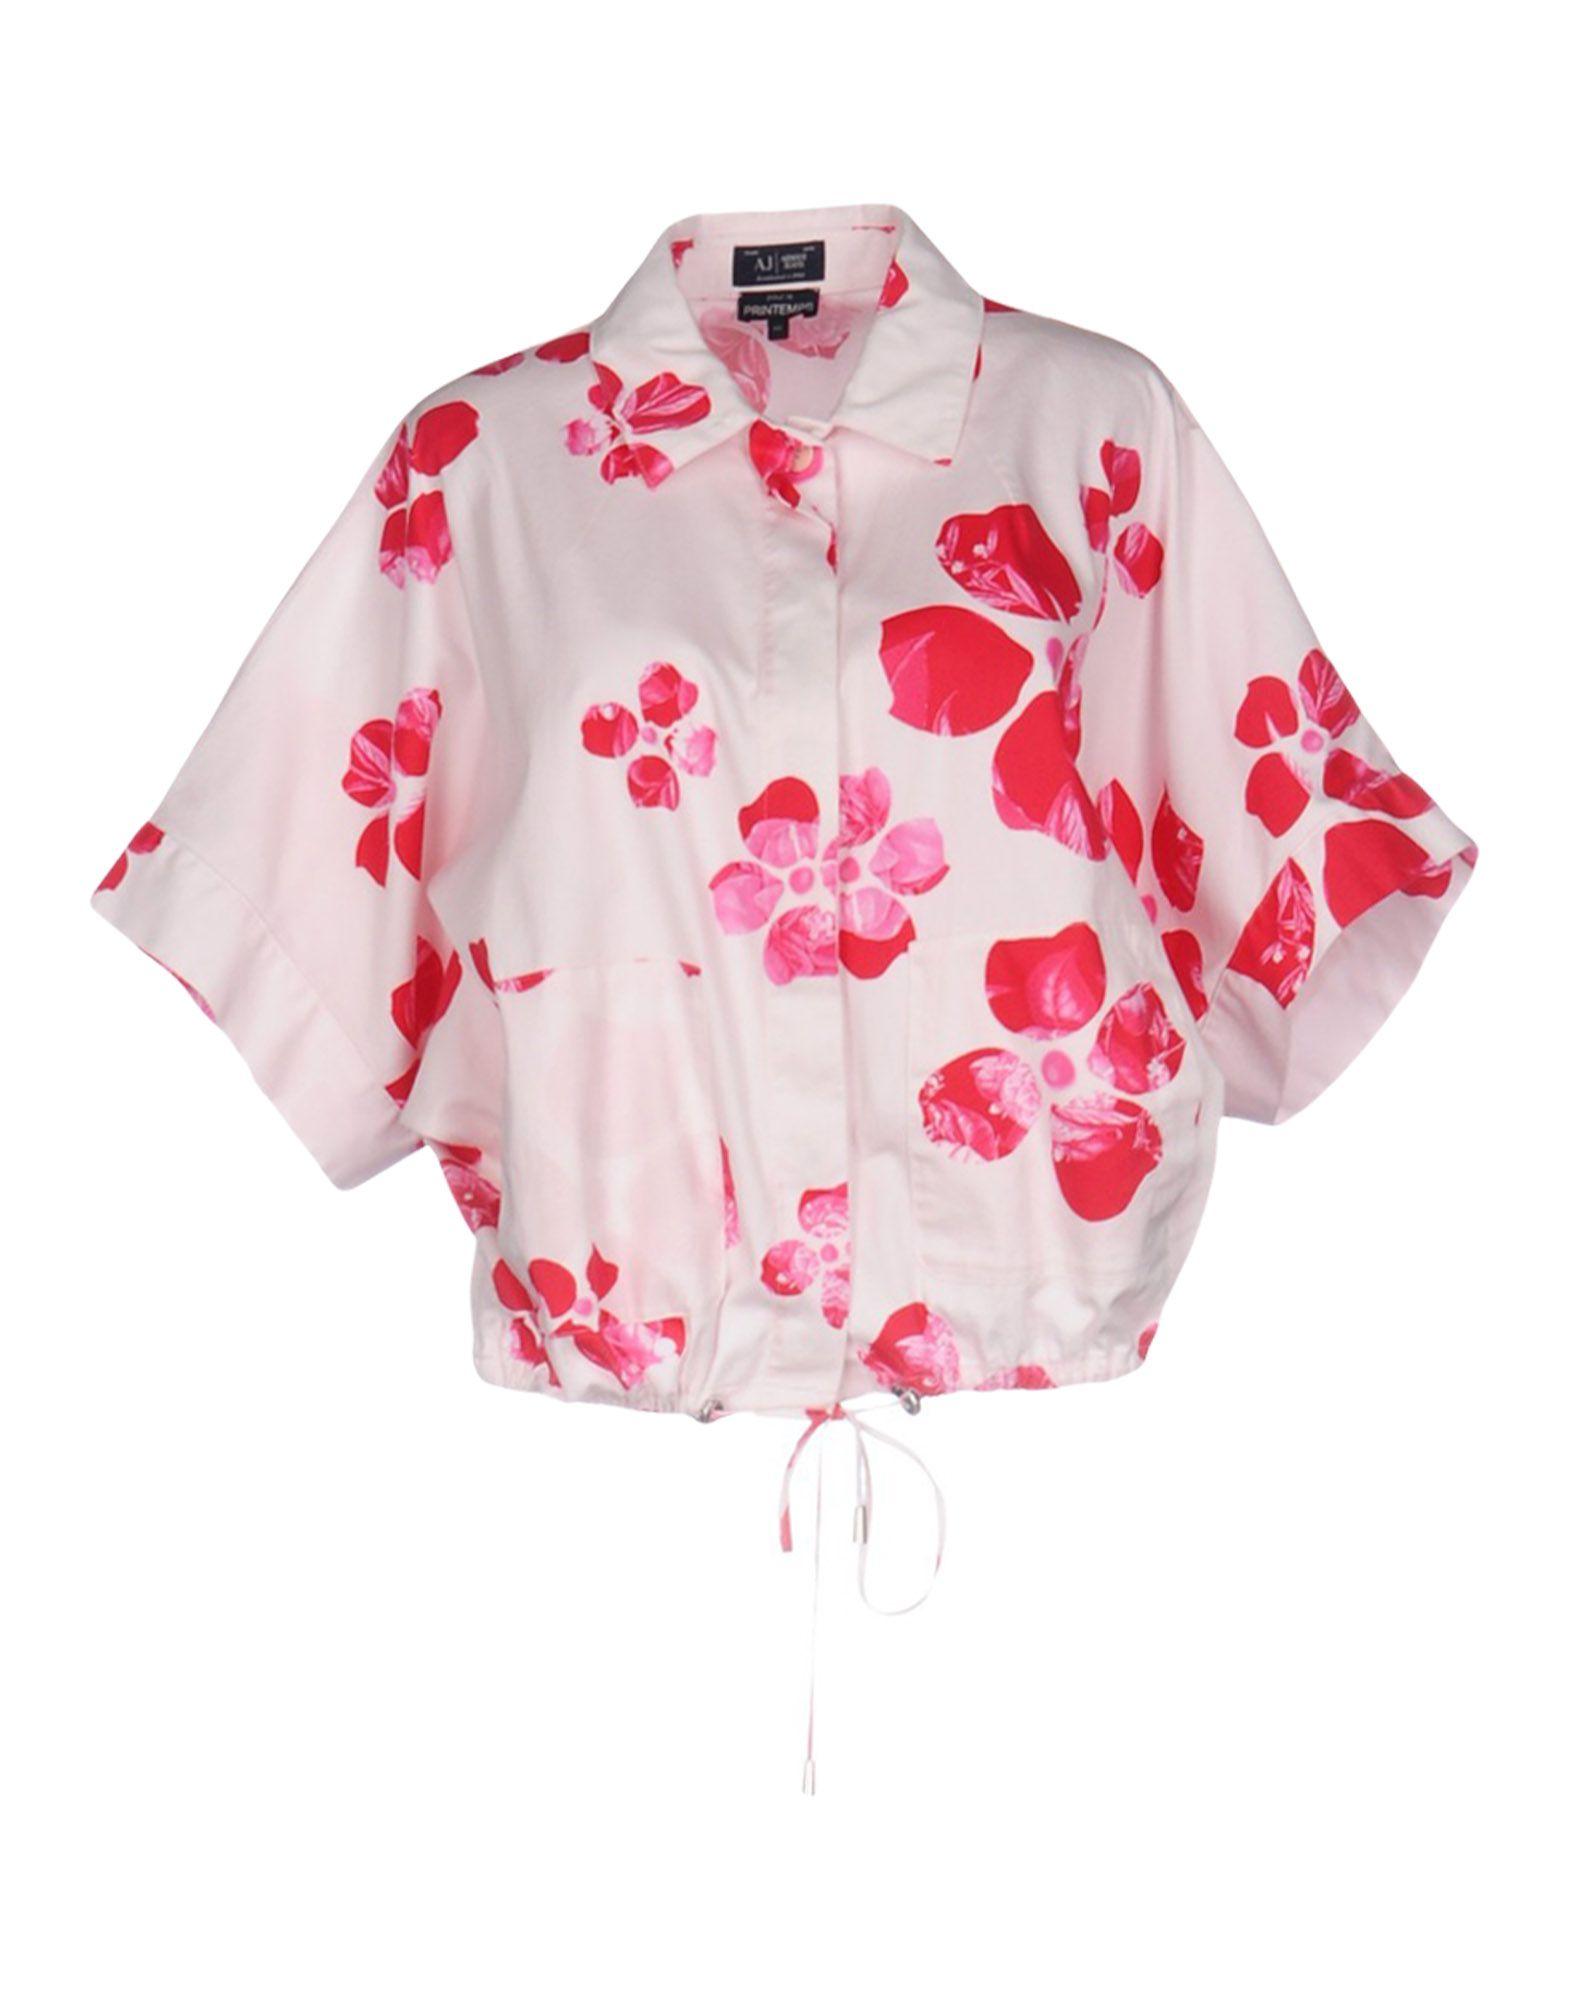 ARMANI JEANS Damen Hemd Farbe Hellrosa Größe 5 jetztbilligerkaufen